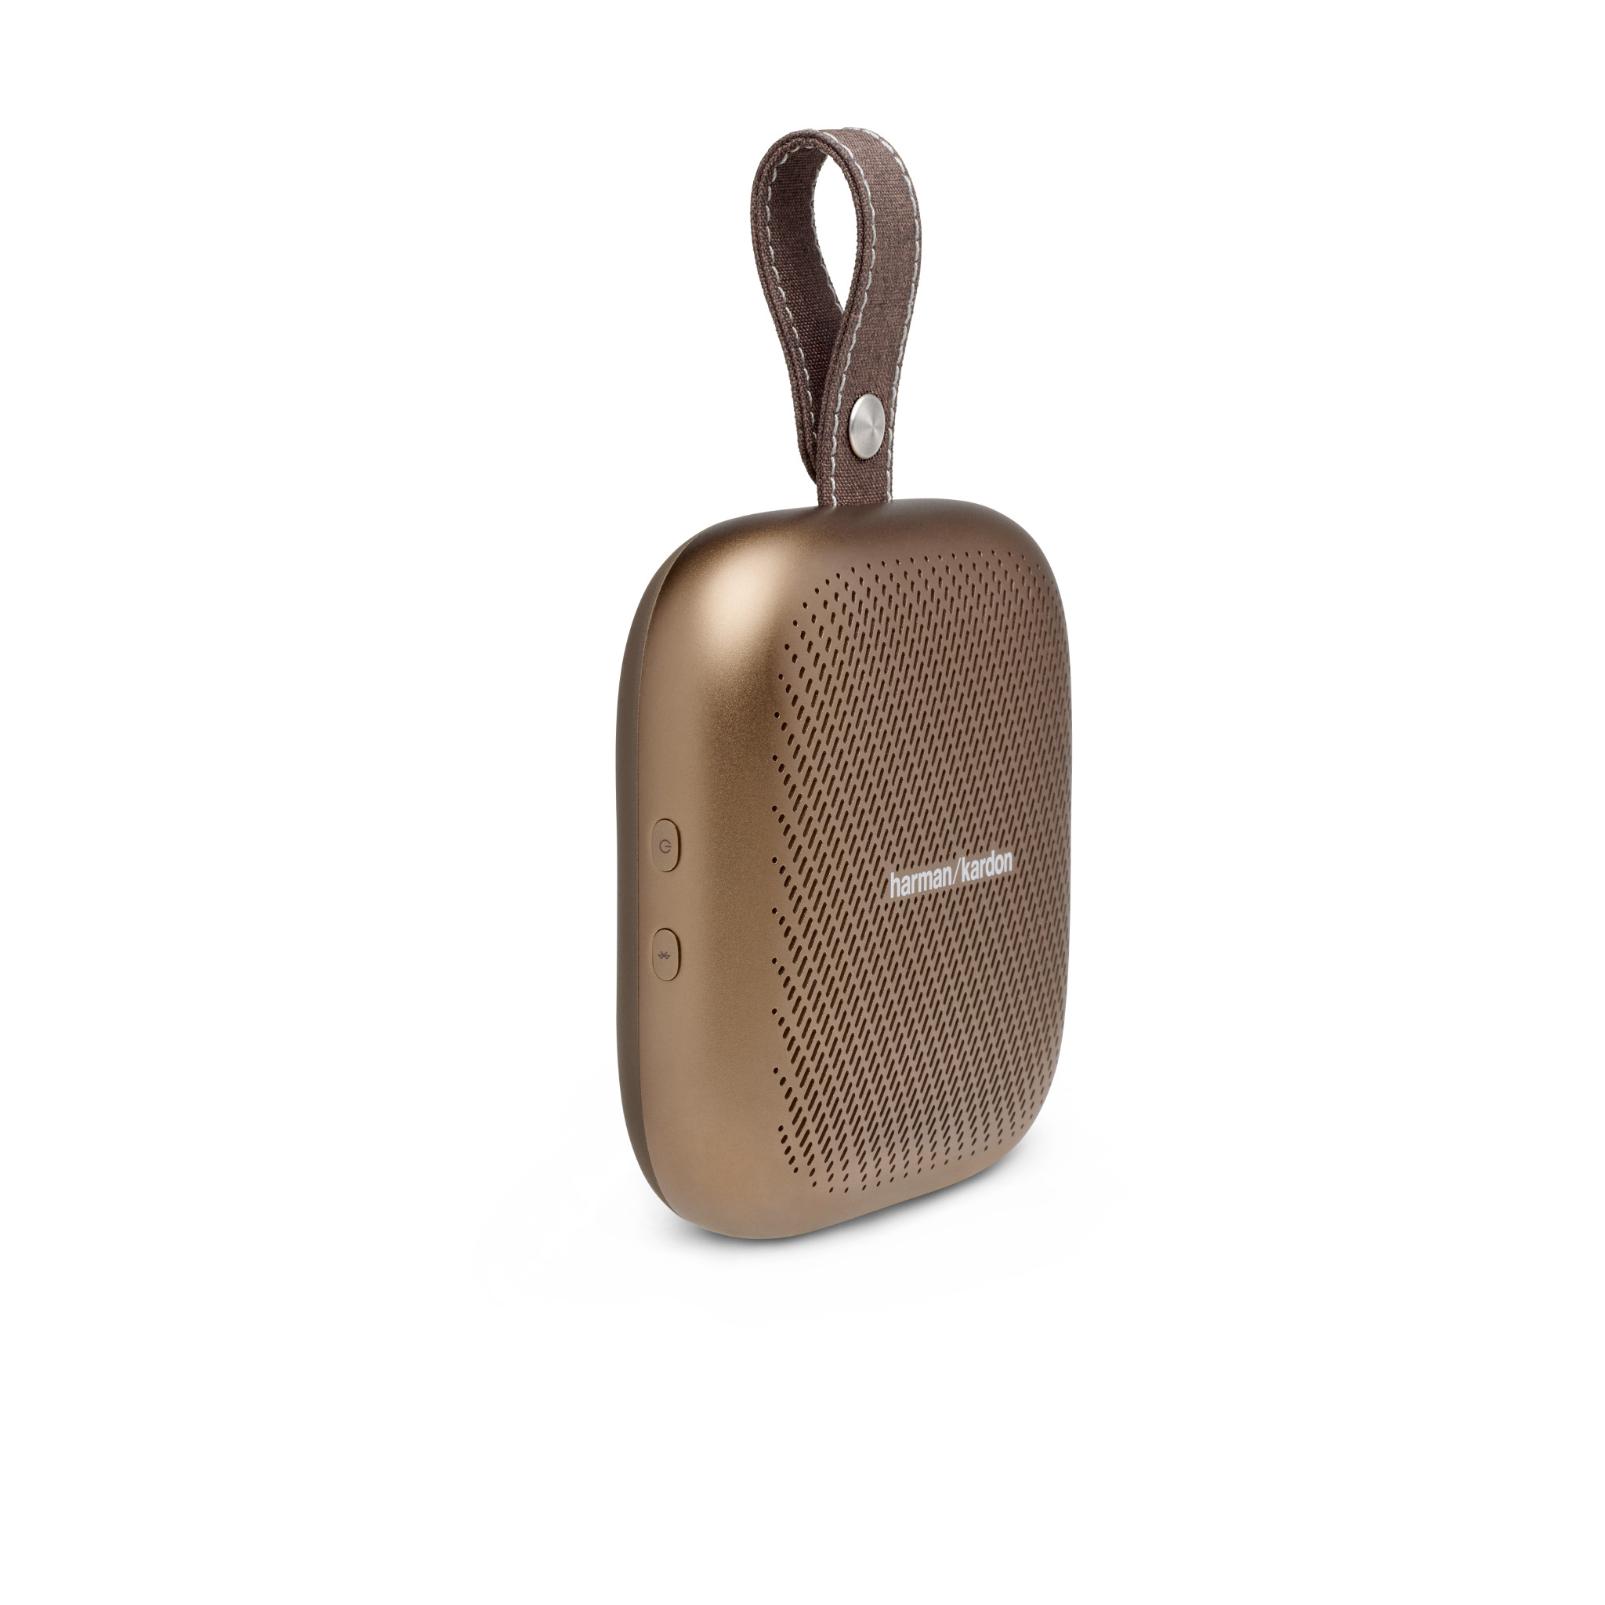 Harman Kardon Neo - Copper - Portable Bluetooth speaker - Detailshot 2